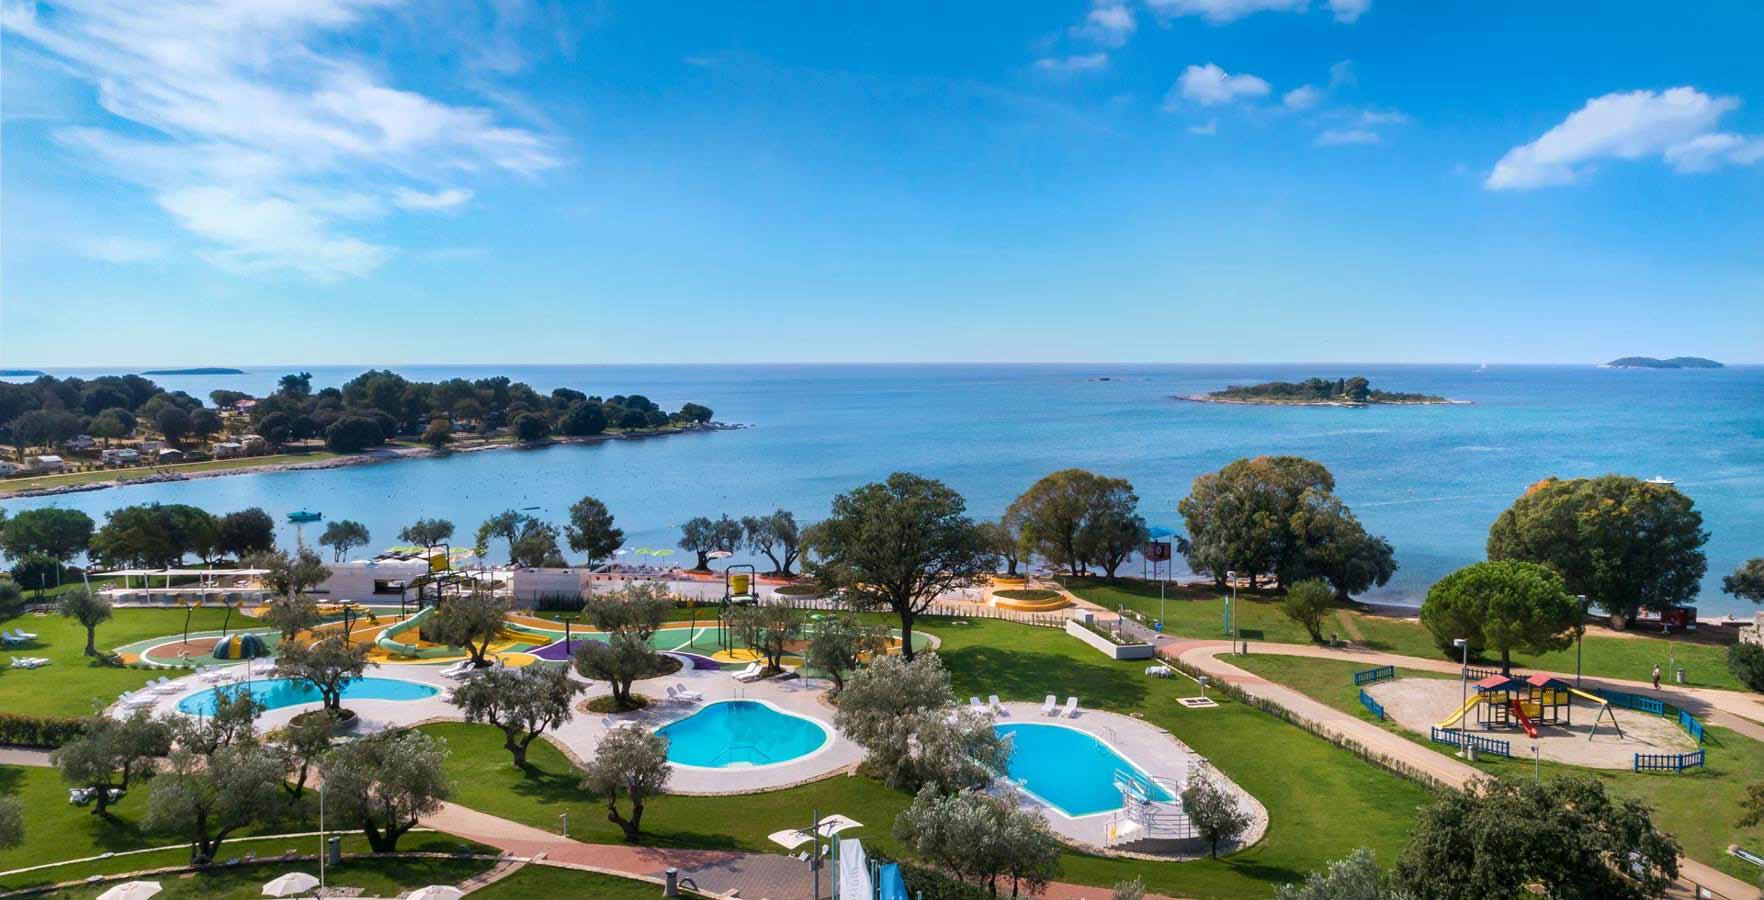 Camping Polari   Istria  Croatia   Allcamps